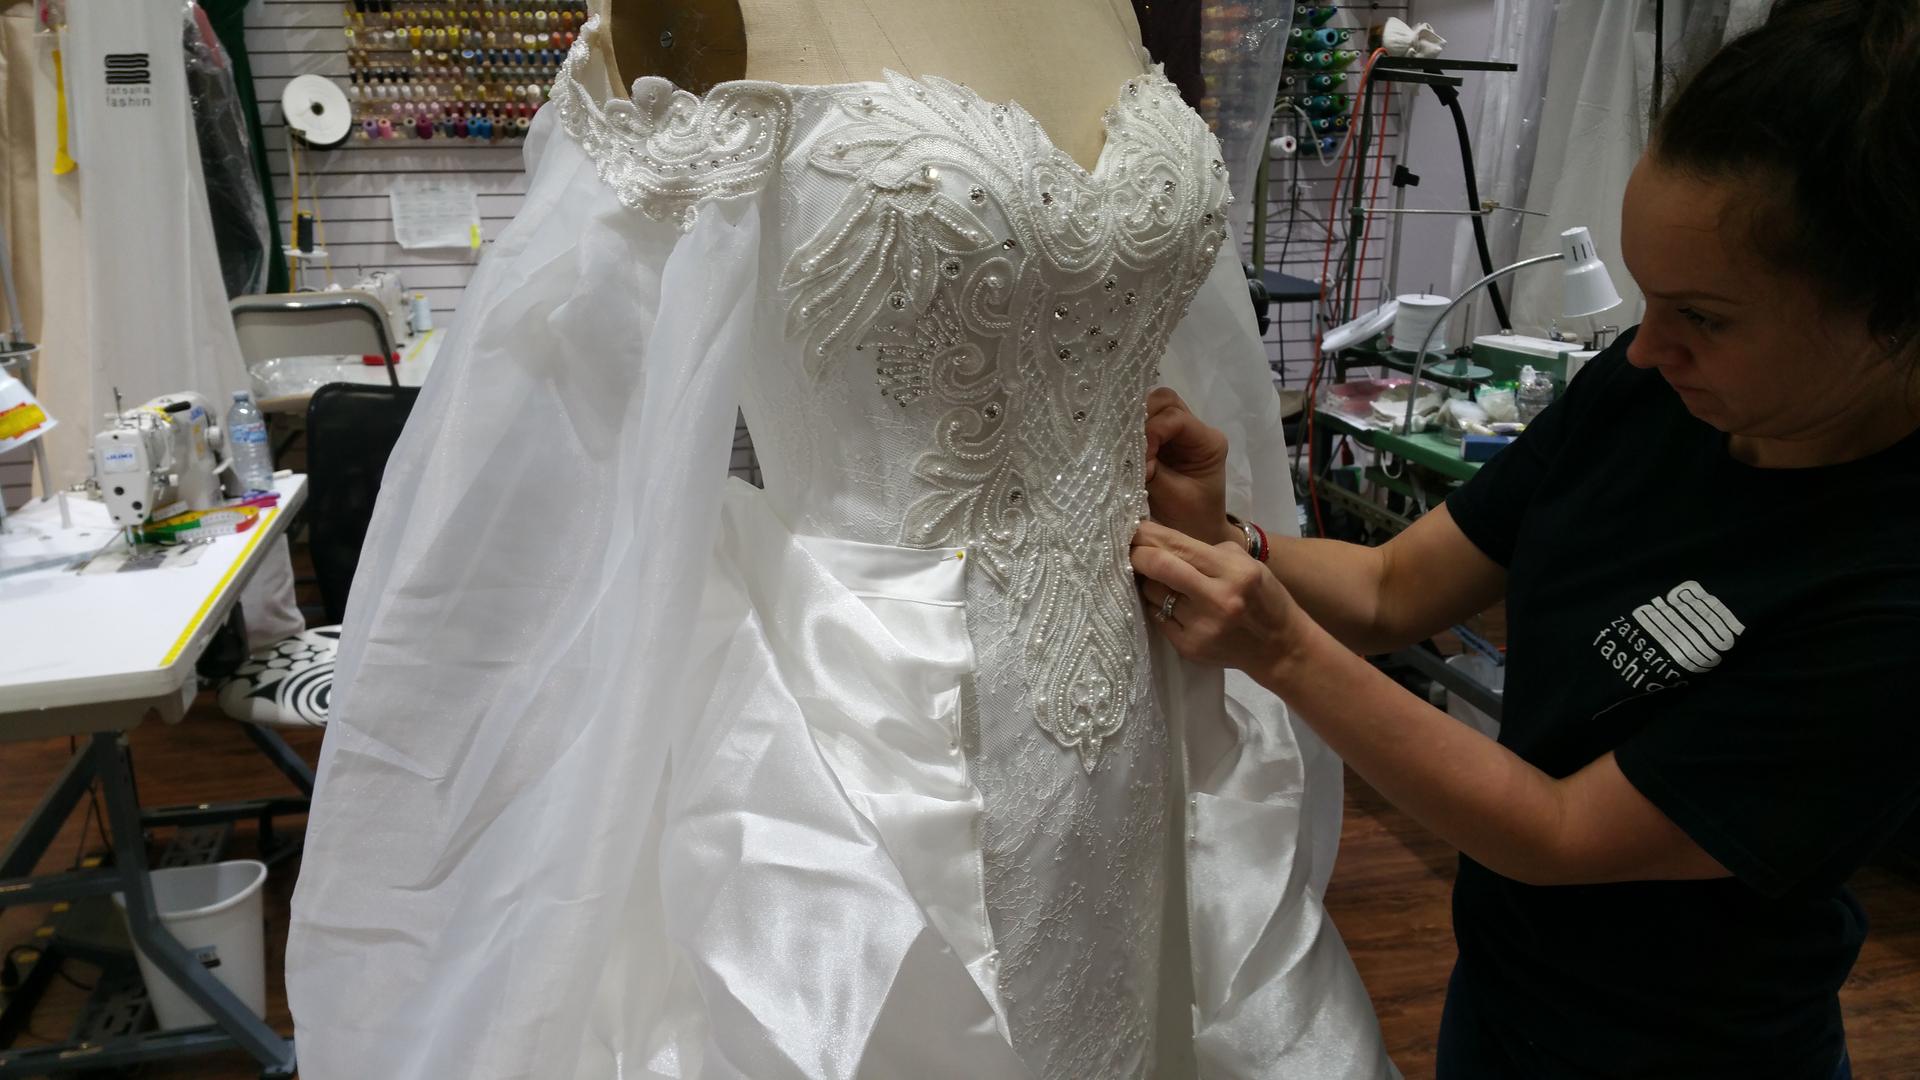 Bridal dress alterations, Prom alterations, Wedding dress design